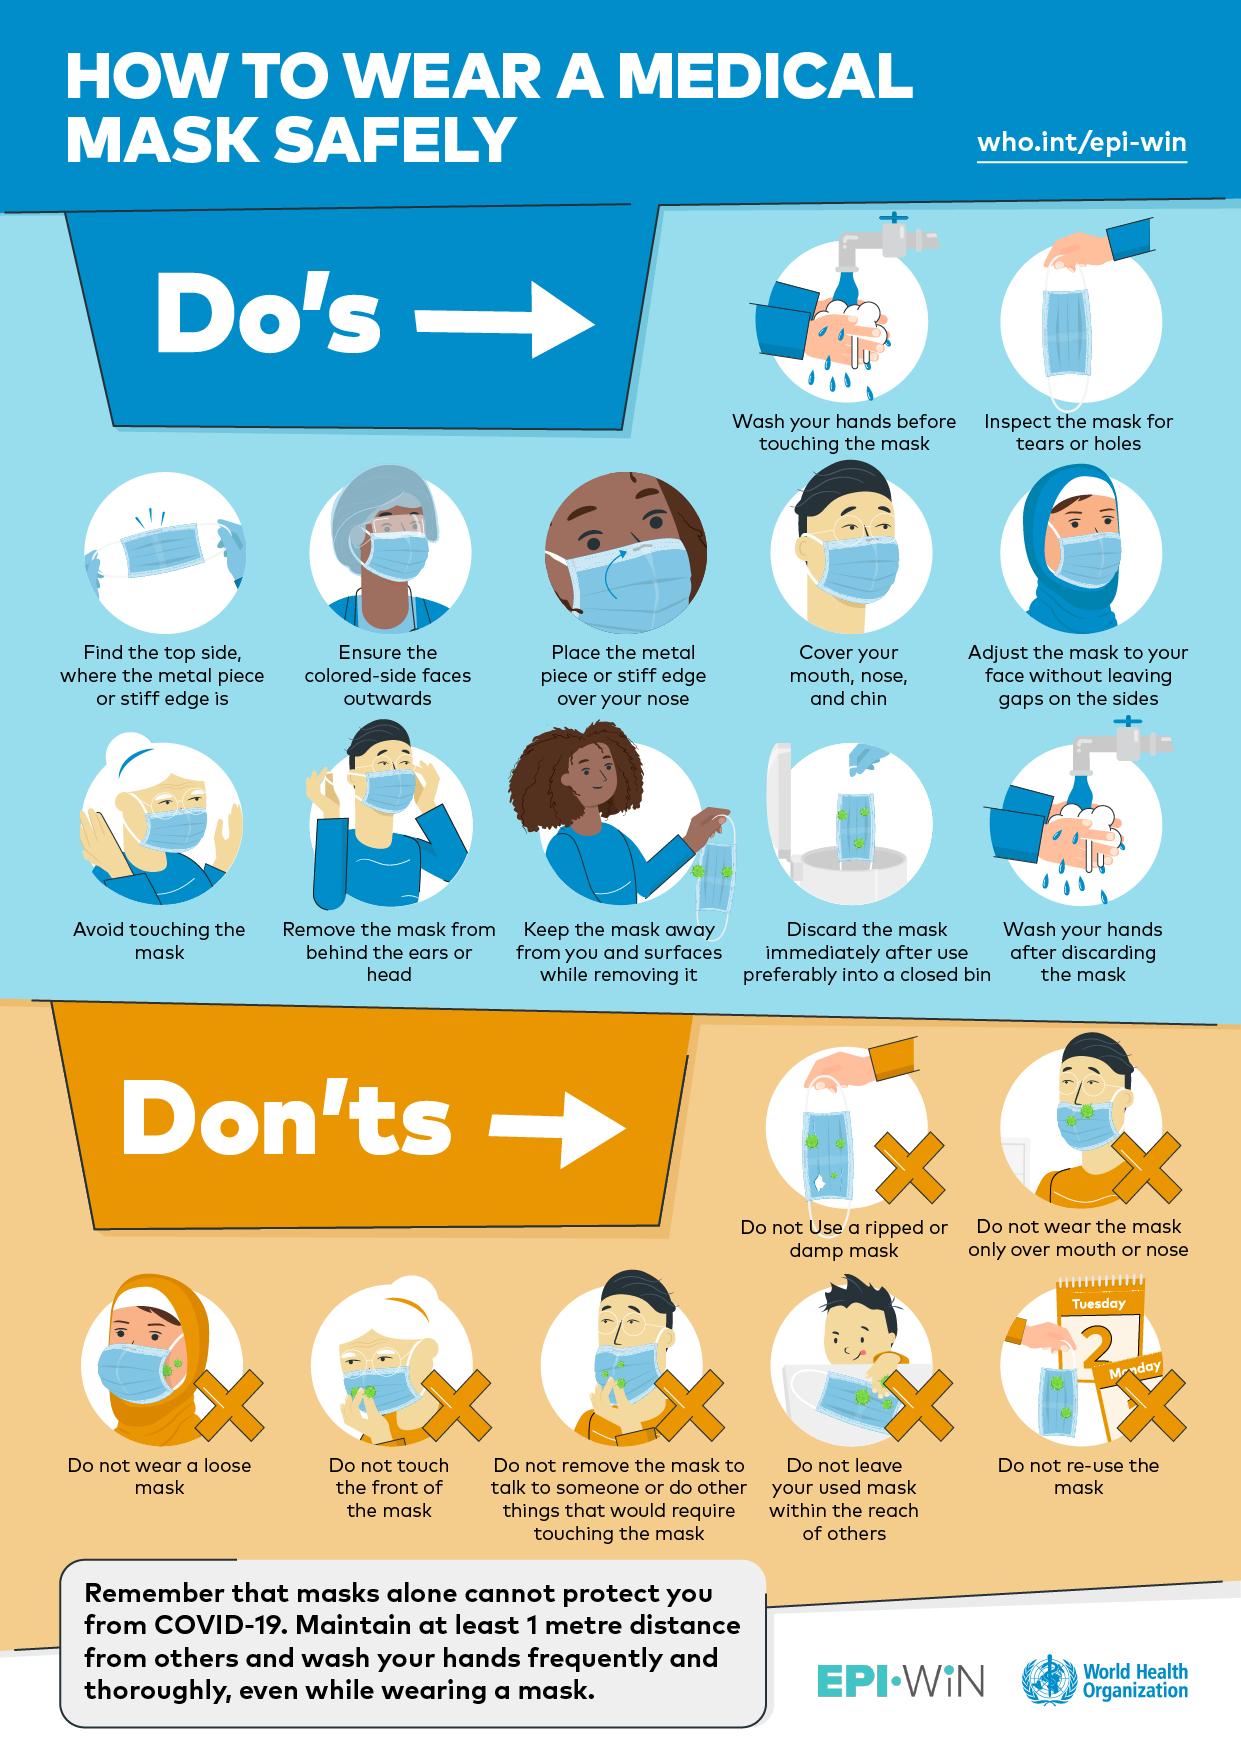 How To Wear Medical Masks Safely